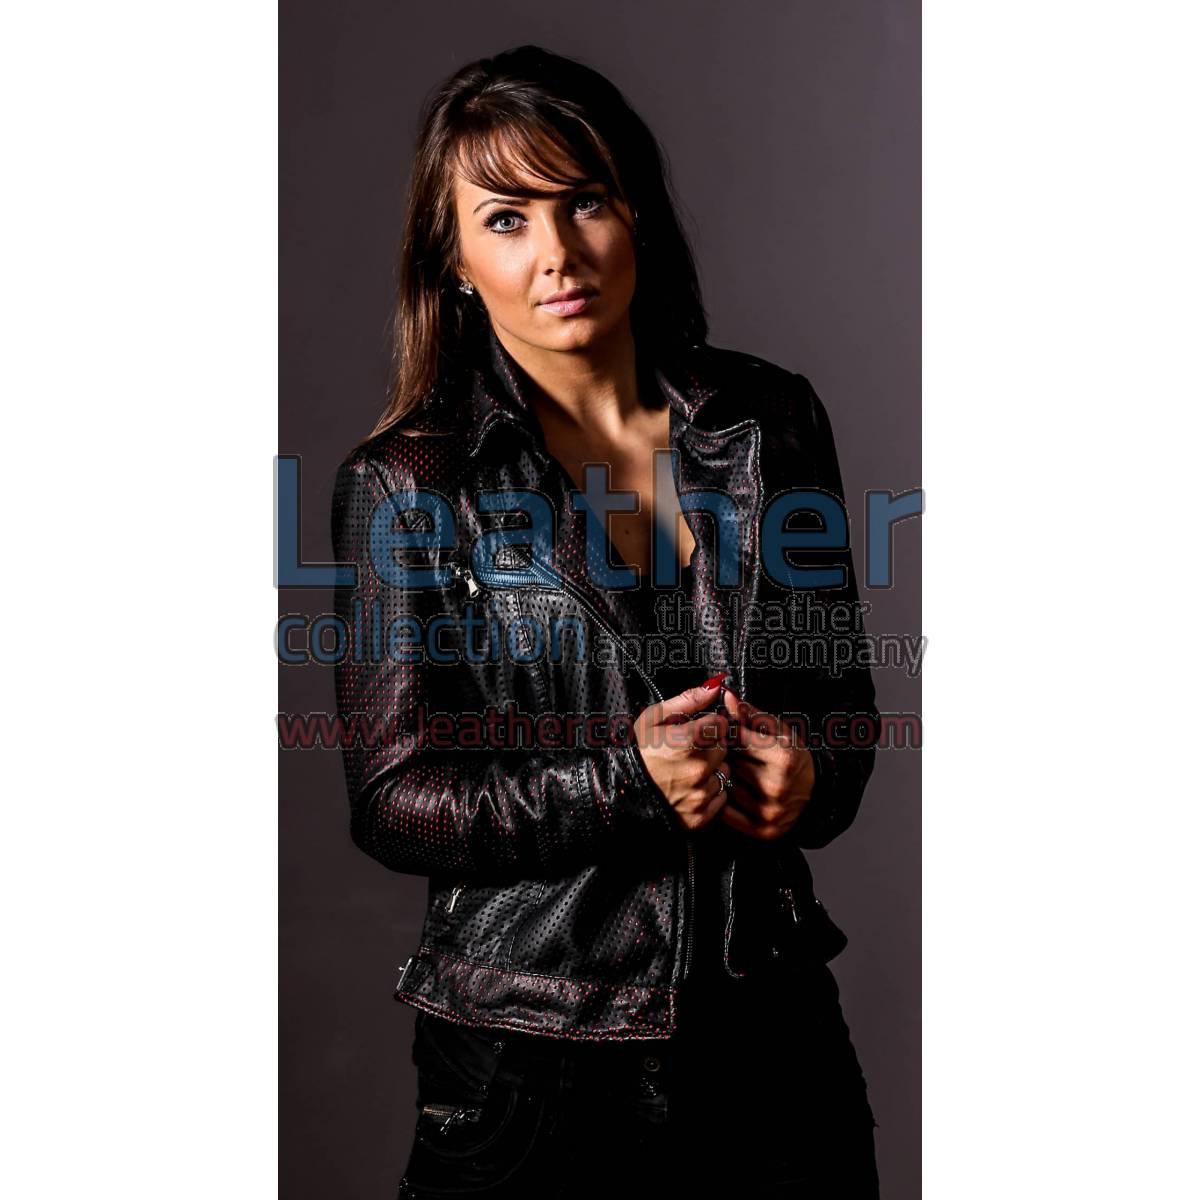 She Devil Perforated Bomber jacket